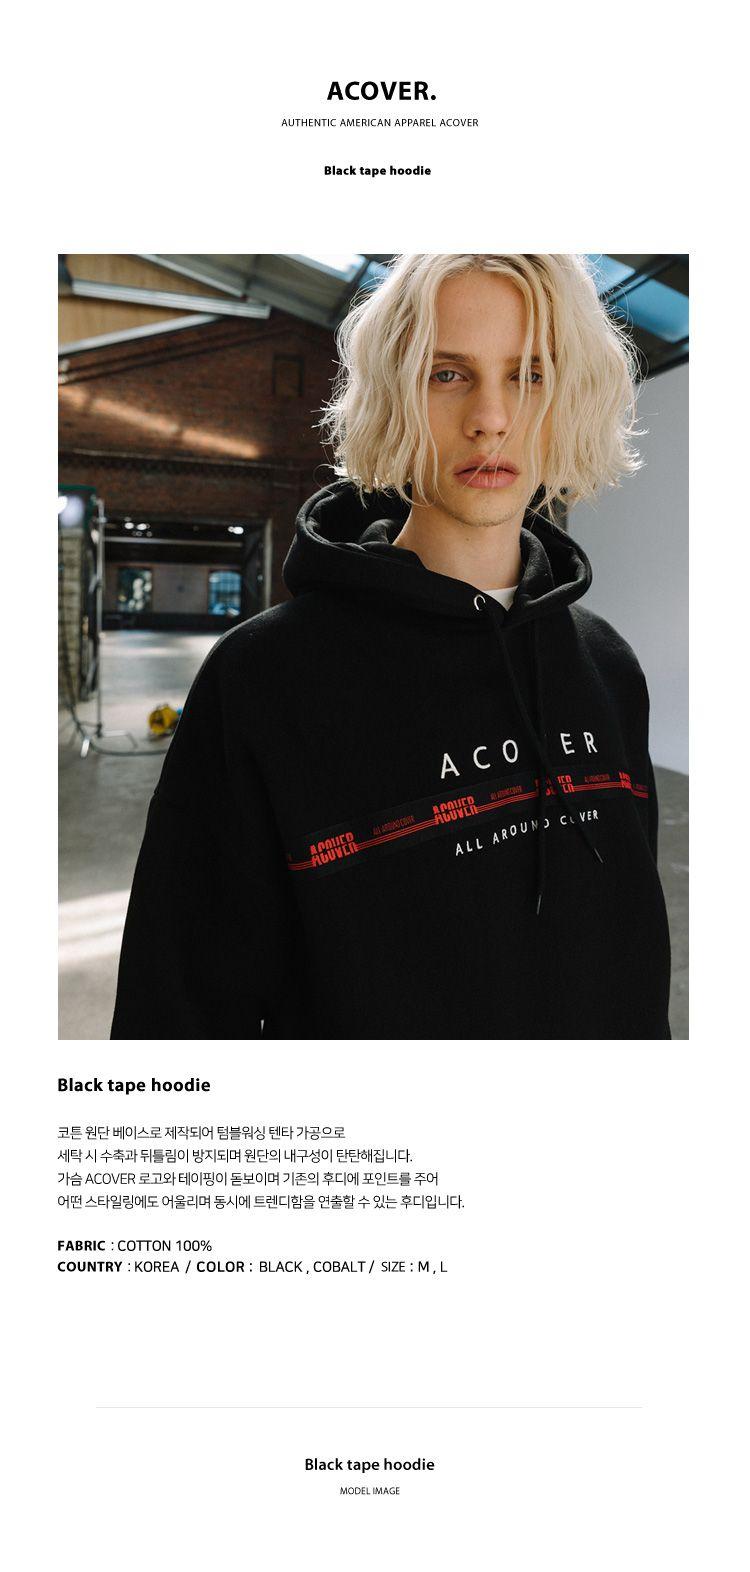 Pin By Lydia Shi On Mmm In 2018 Pinterest Fashion Sweatshirts Hoodie Jumper Cotton Ml Street Look Bazaars Wear Brand New Cowl Neck